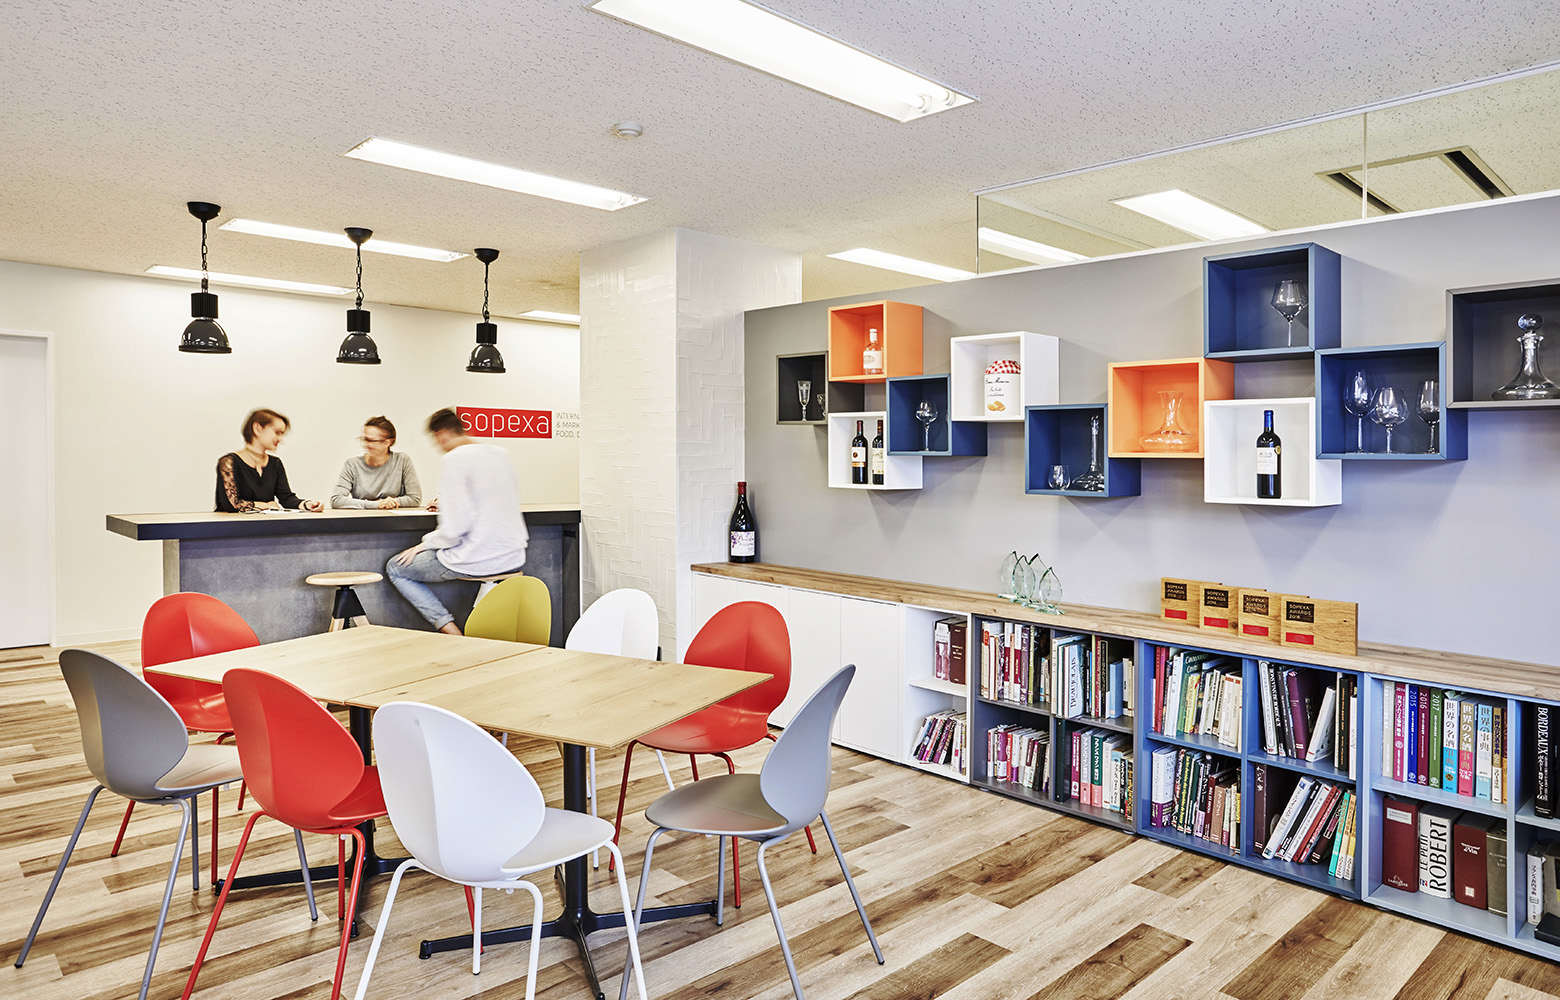 Sopexa Japon 株式会社 Refresh Space デザイン・レイアウト事例